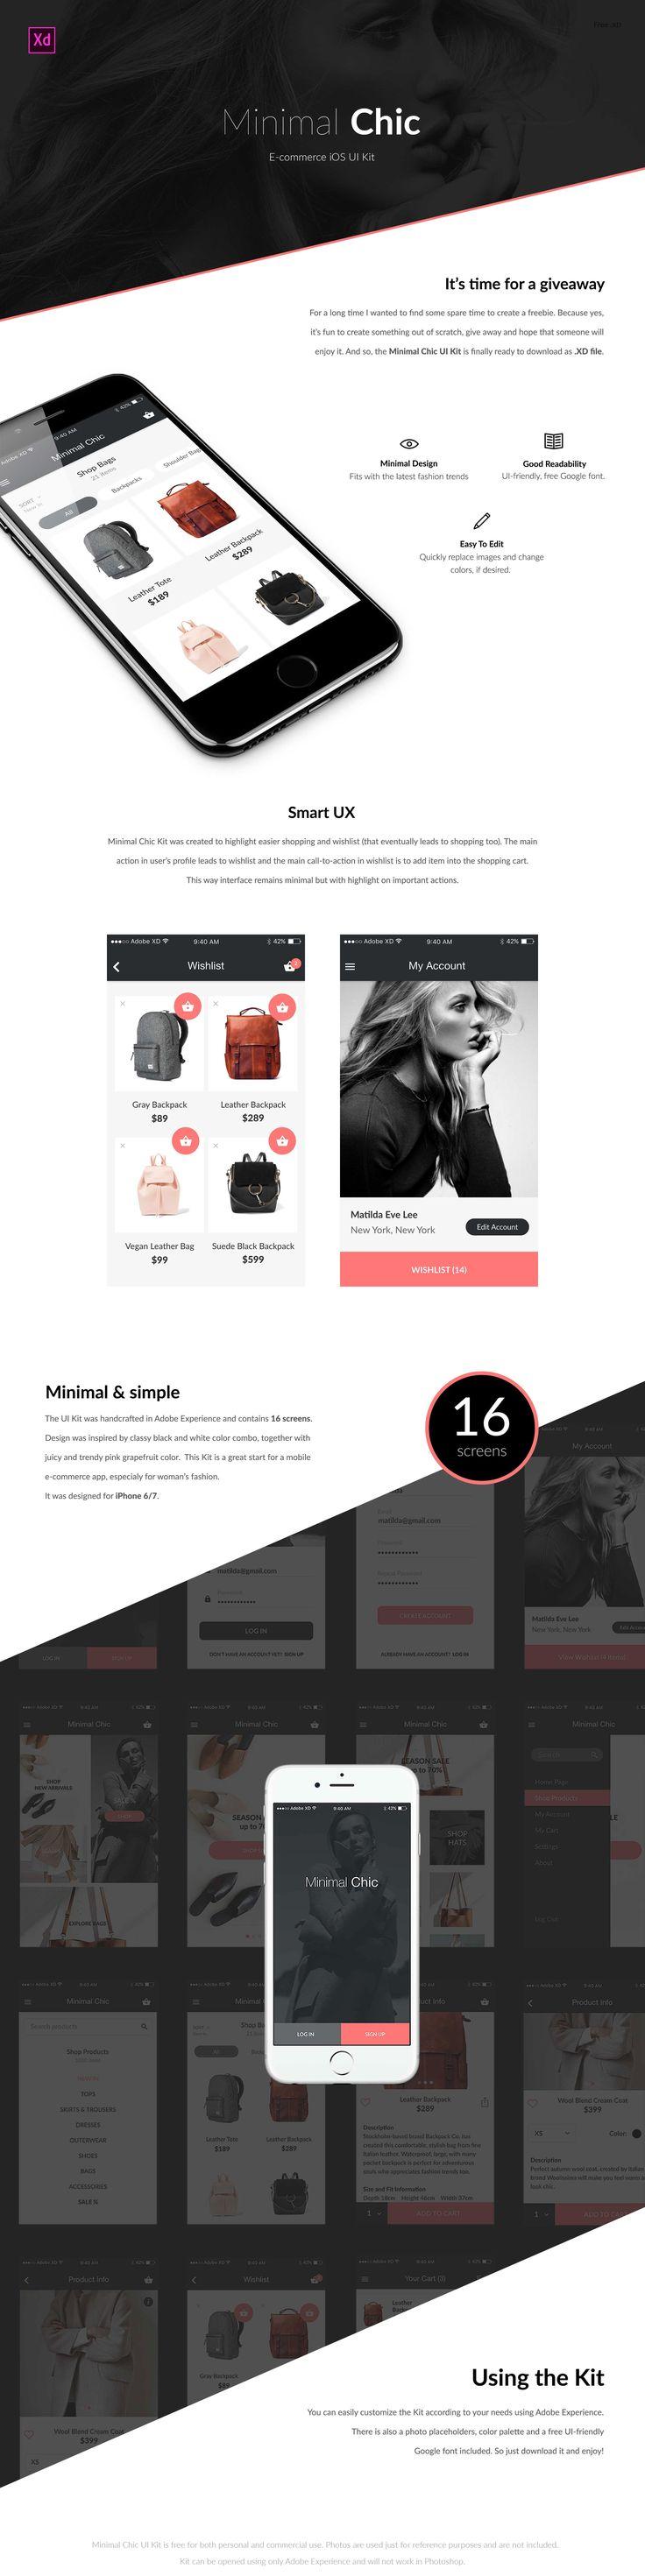 E-commerce iOS App design for XD - Freebie